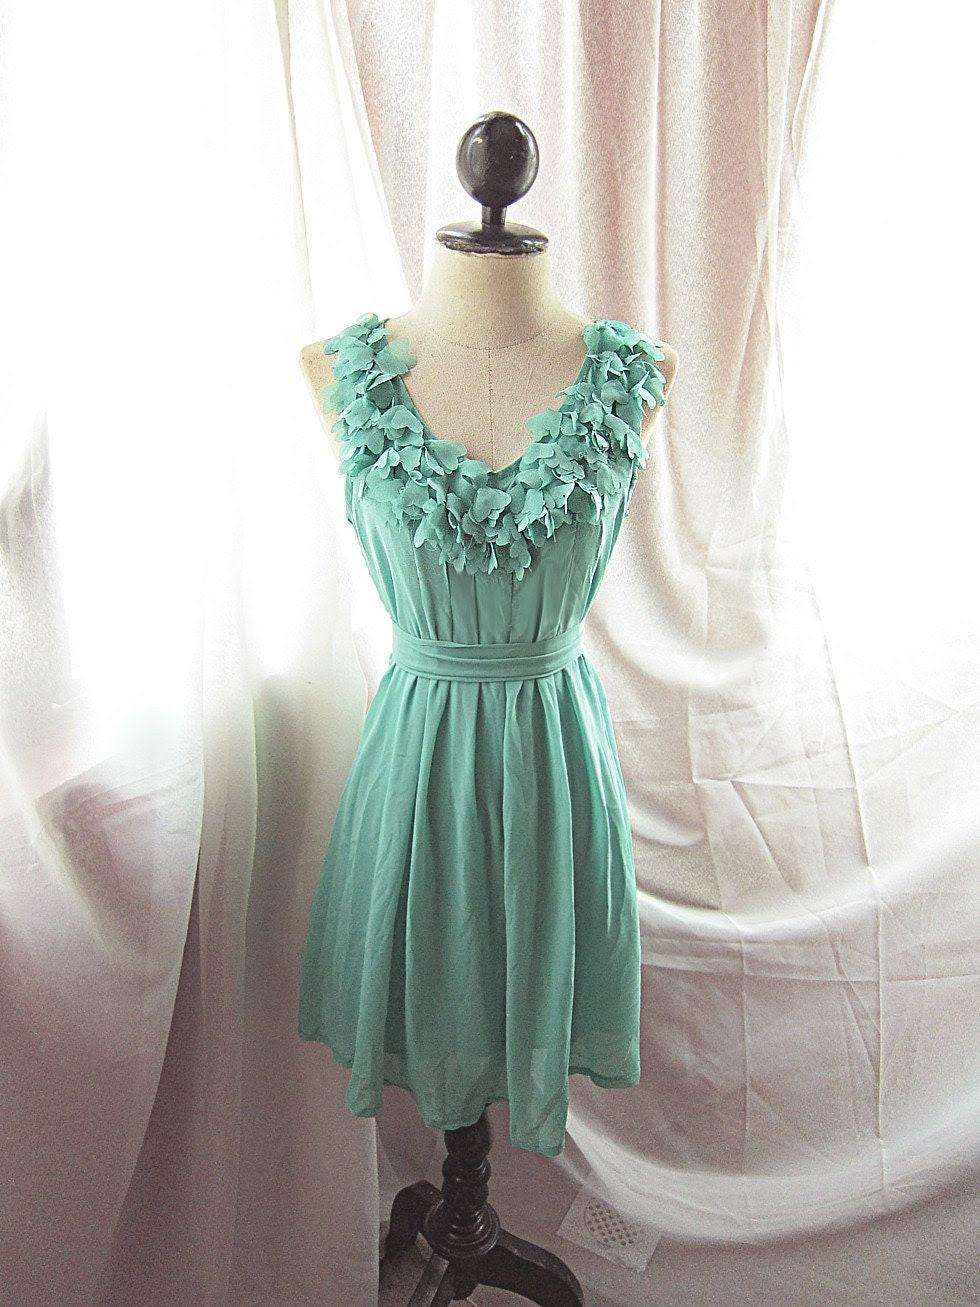 Lovely Soft Minty Green Misty Vine Nature Spring Dreamy Romantic Havisham Mille Feuille Heart Cutouts Flirty Chiffon Flowy Dress